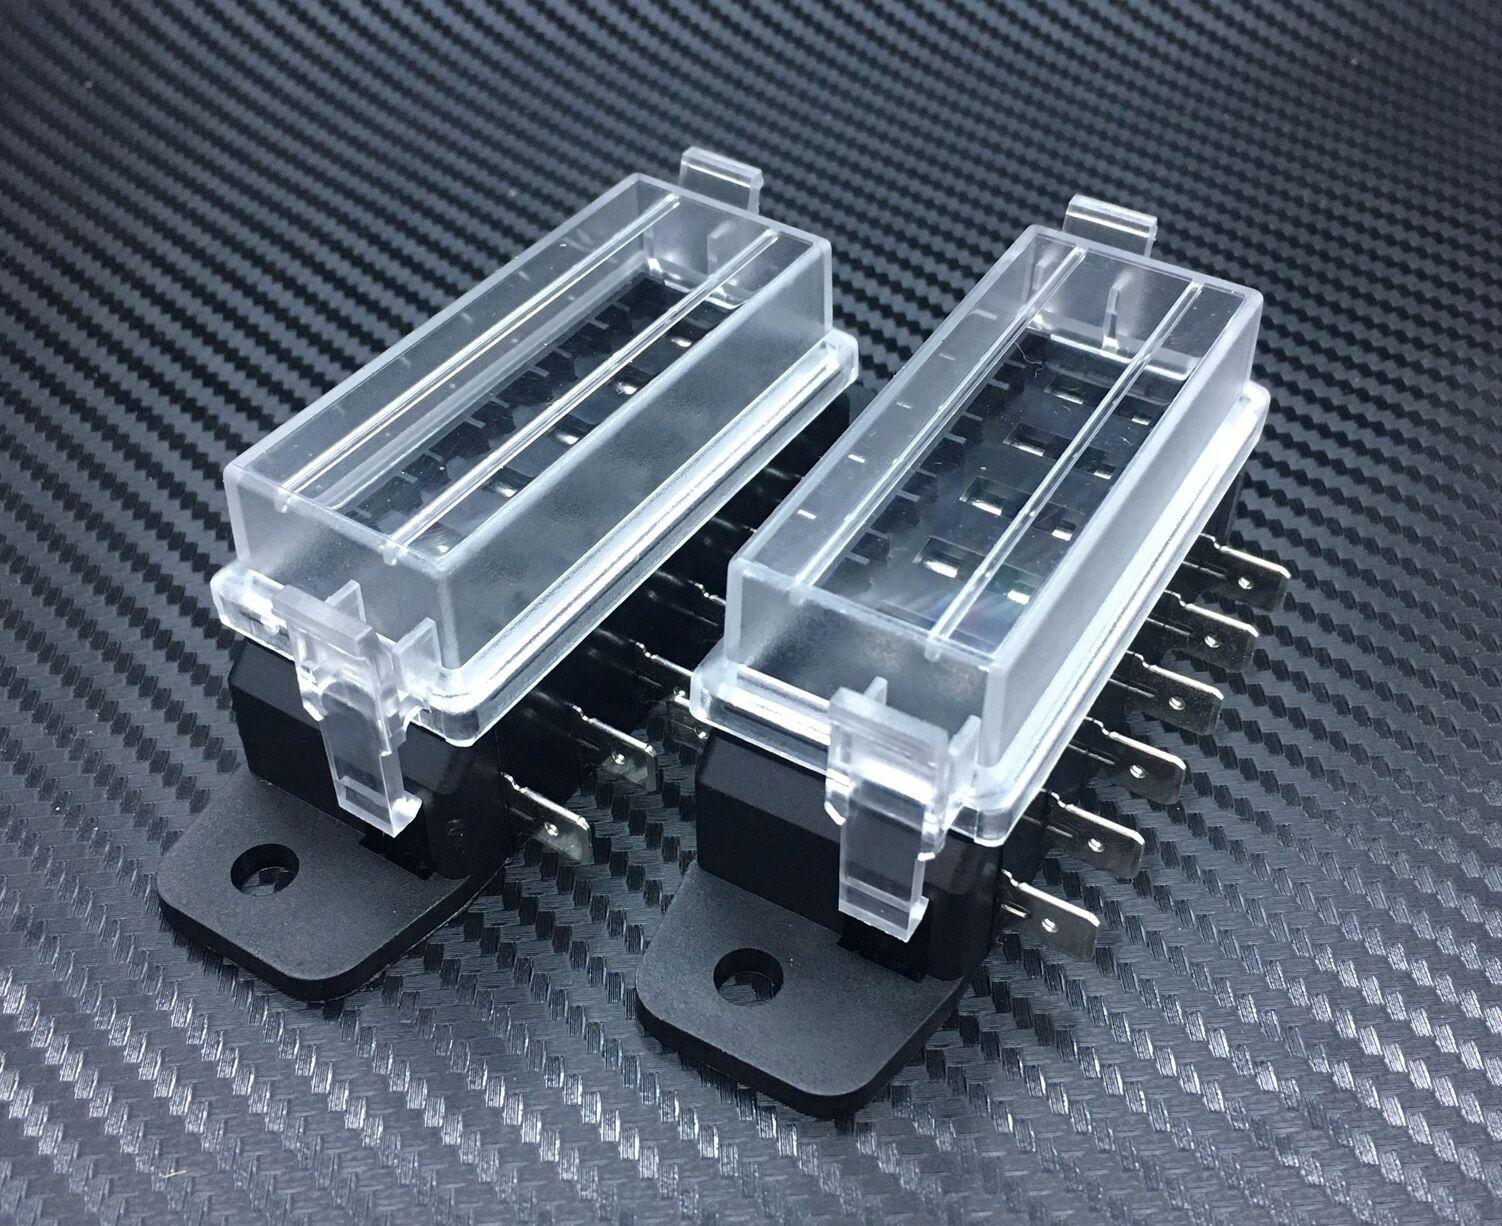 IZTOSS DC 32V 12 Way Terminals Circuit ATC ATO Car Auto Blade Fuse Blocks Box Holder with 10 pcs fuse,fuse puller and 10pcs connectors